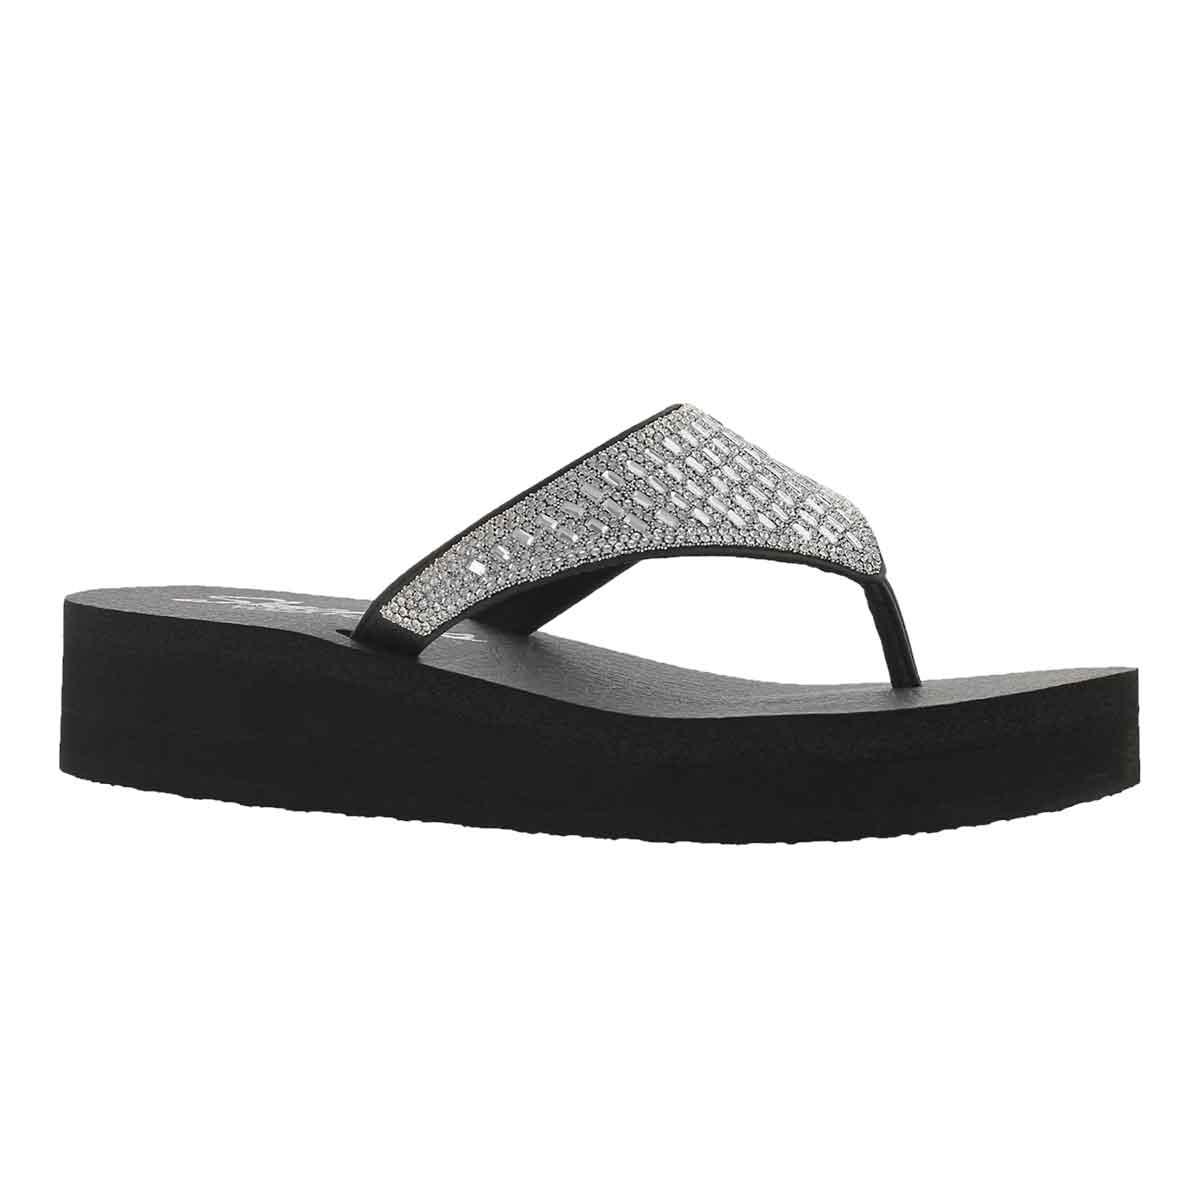 Women's VINYASA black/silver rhinestone flip flops